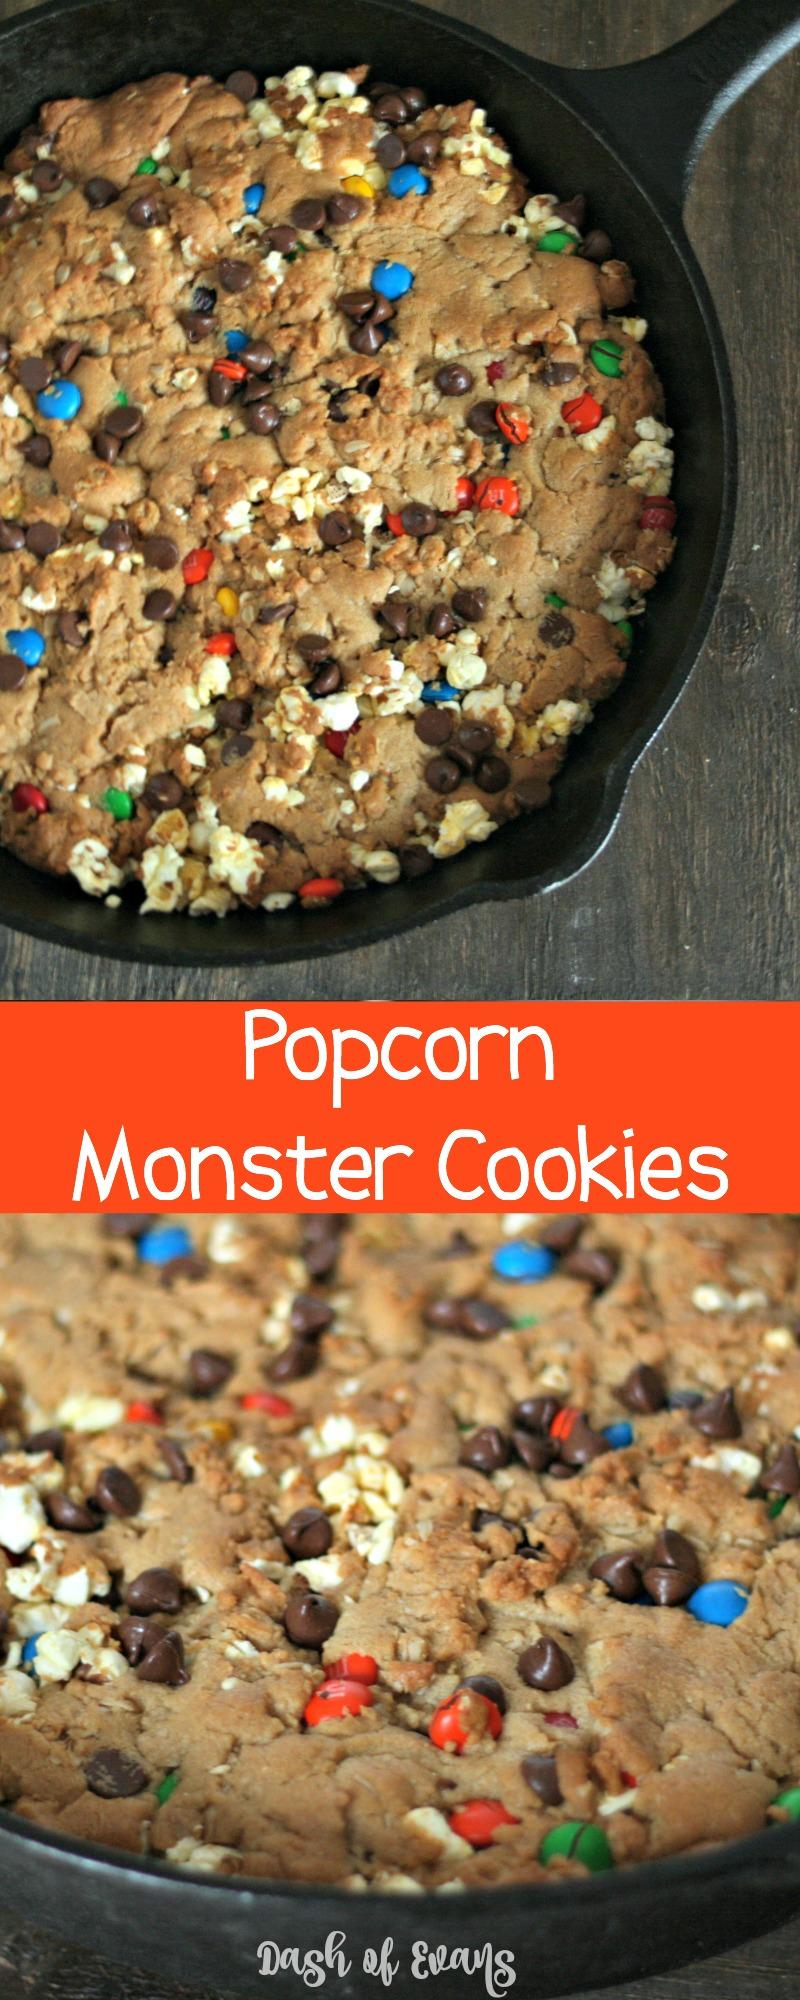 What makes monster cookies even better? POPCORN! #MakeItAMovieNight (ad)